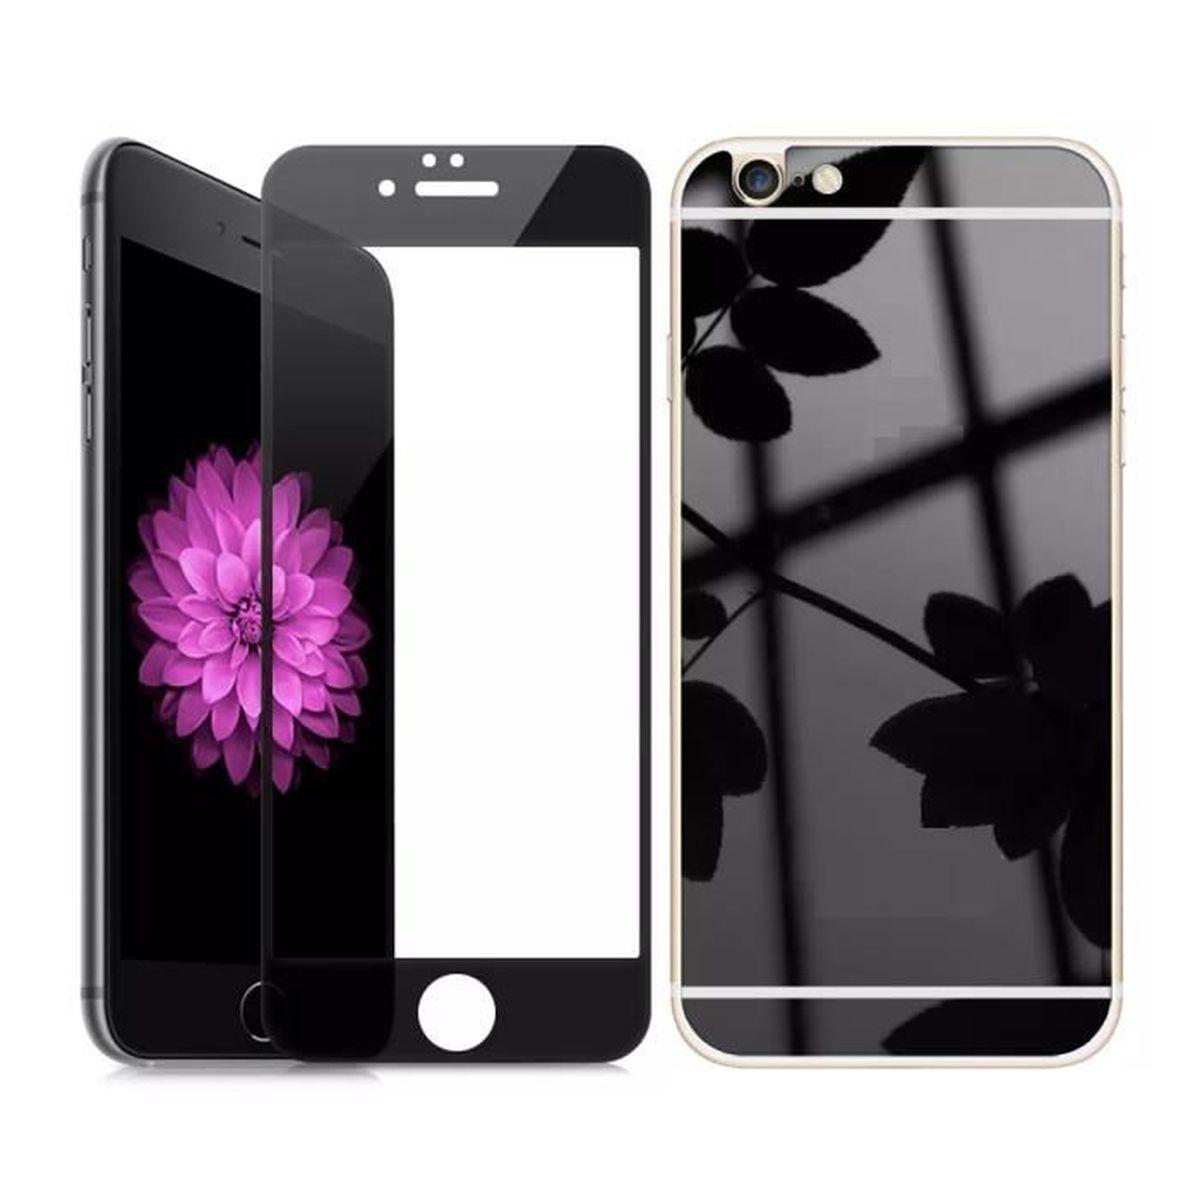 Coque iphone 4s avec miroir